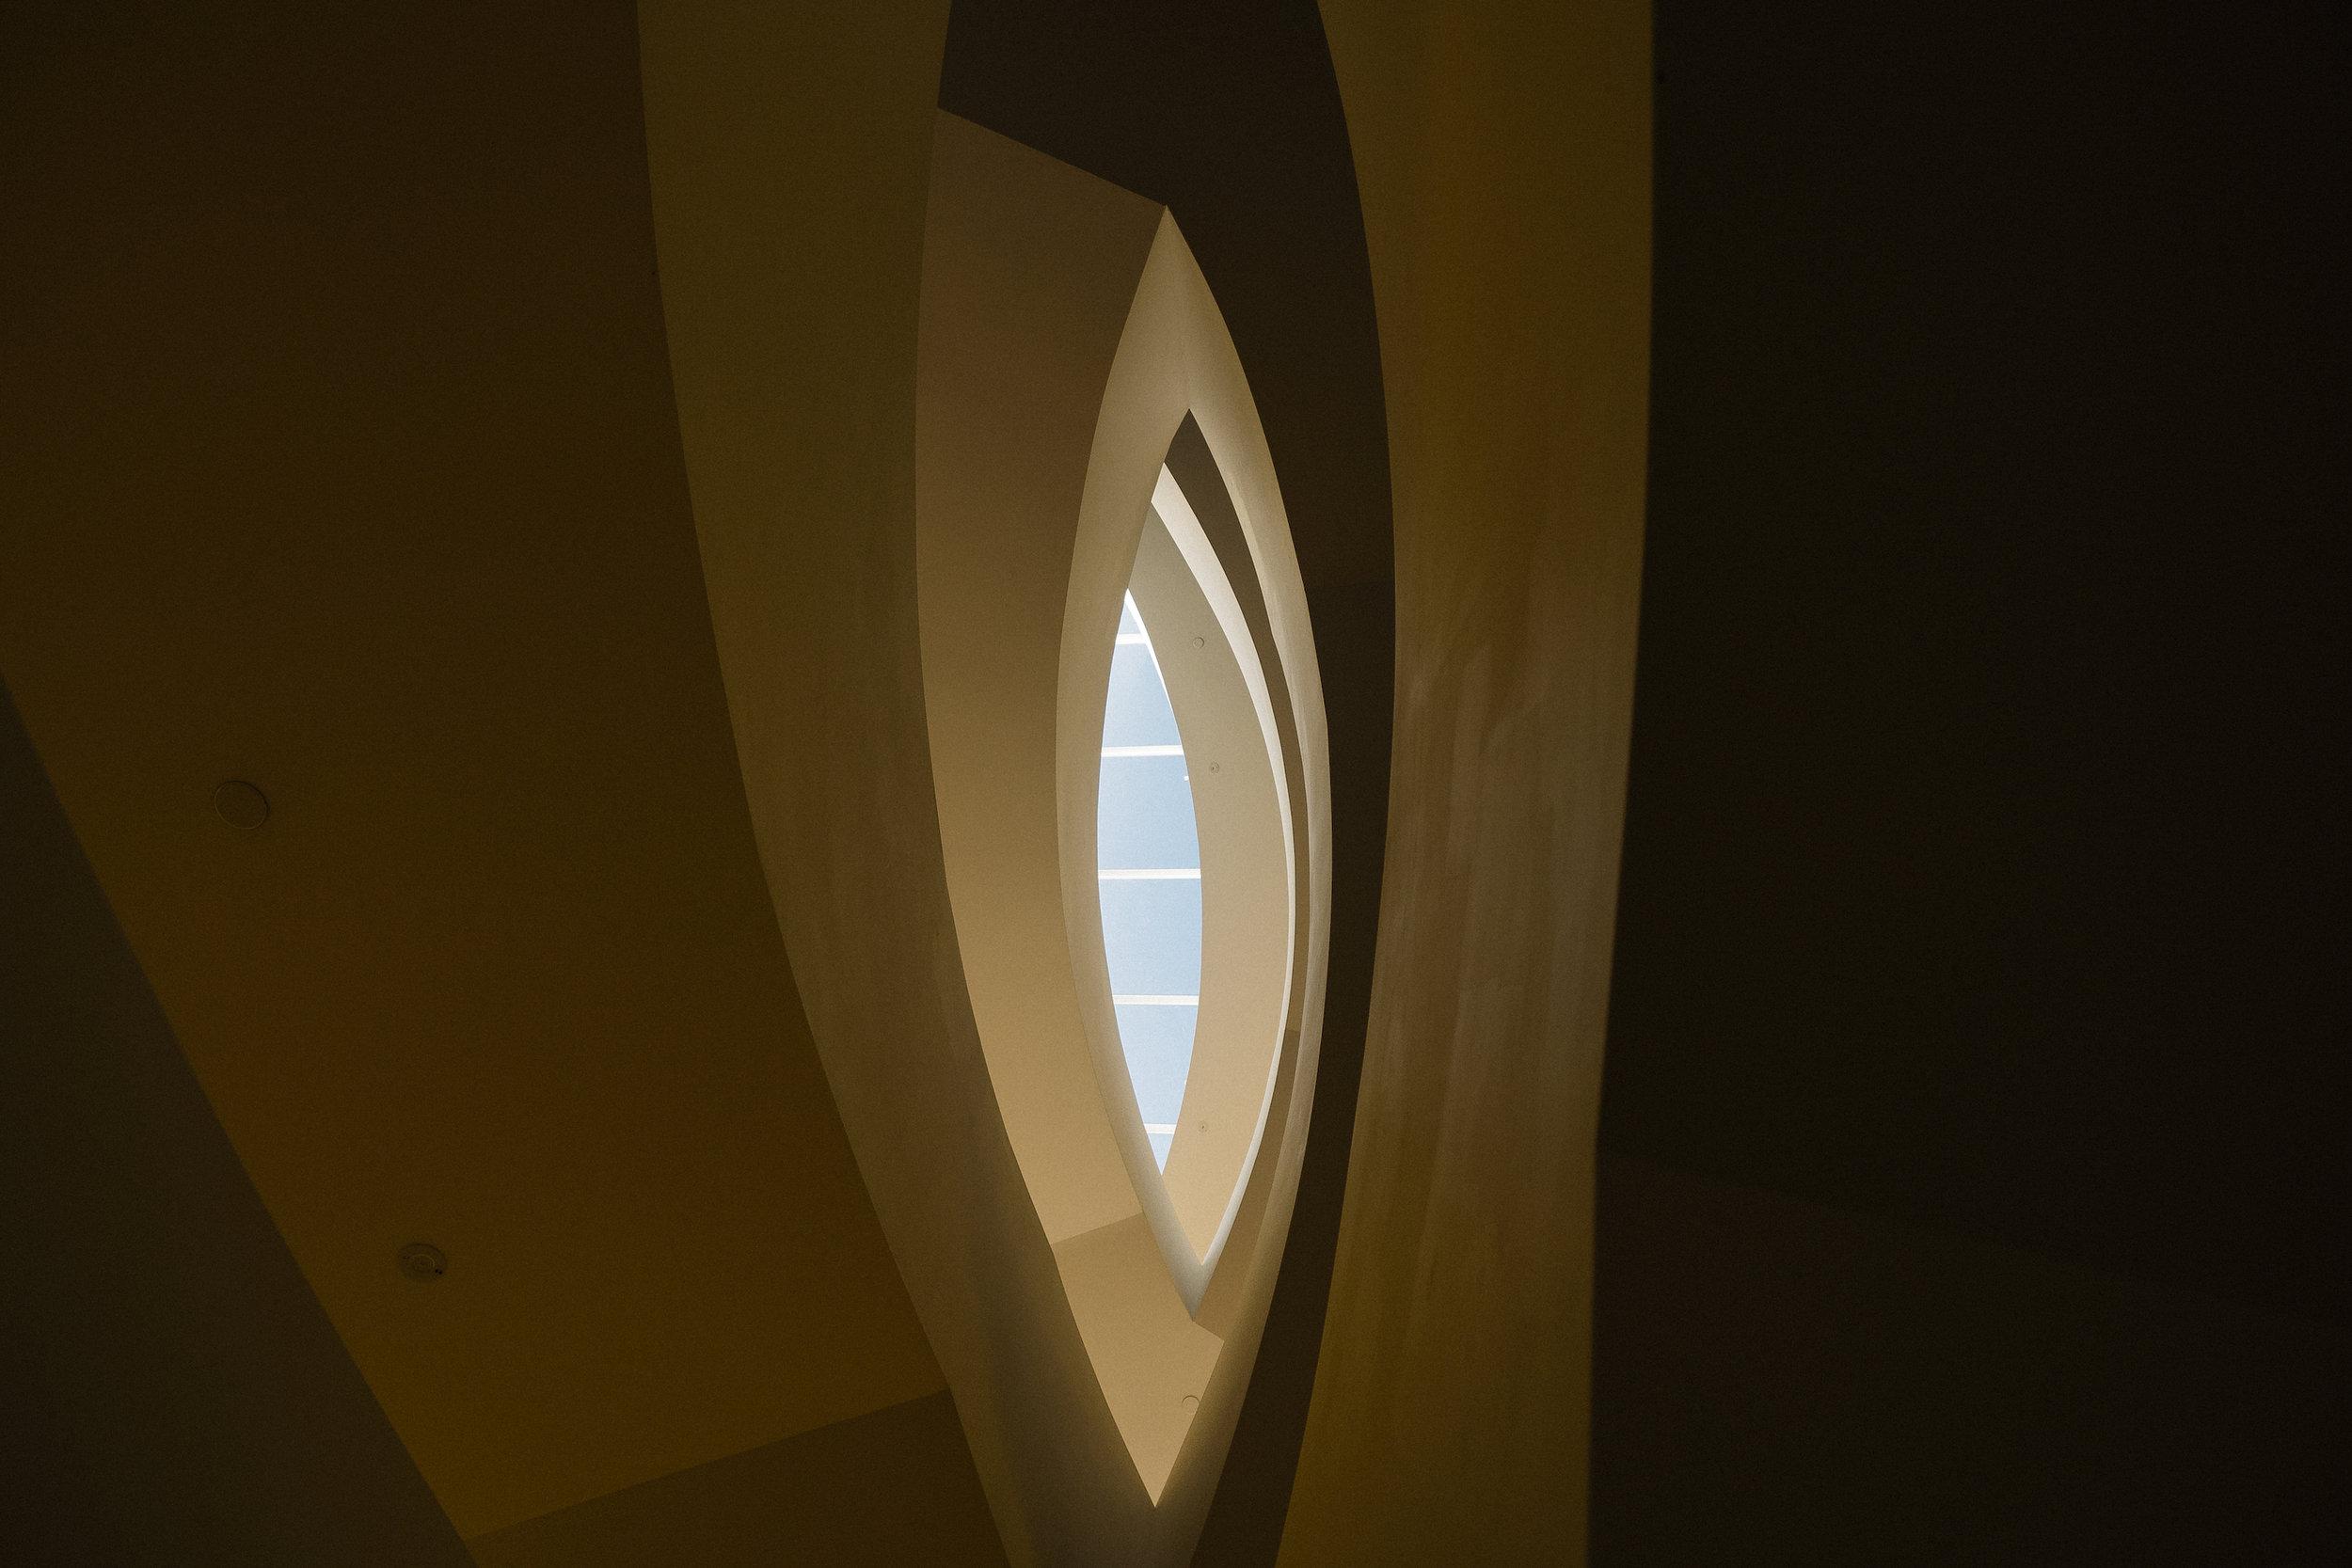 Te Uru Waitakere Contemporary Gallery, New Zealand - 2017